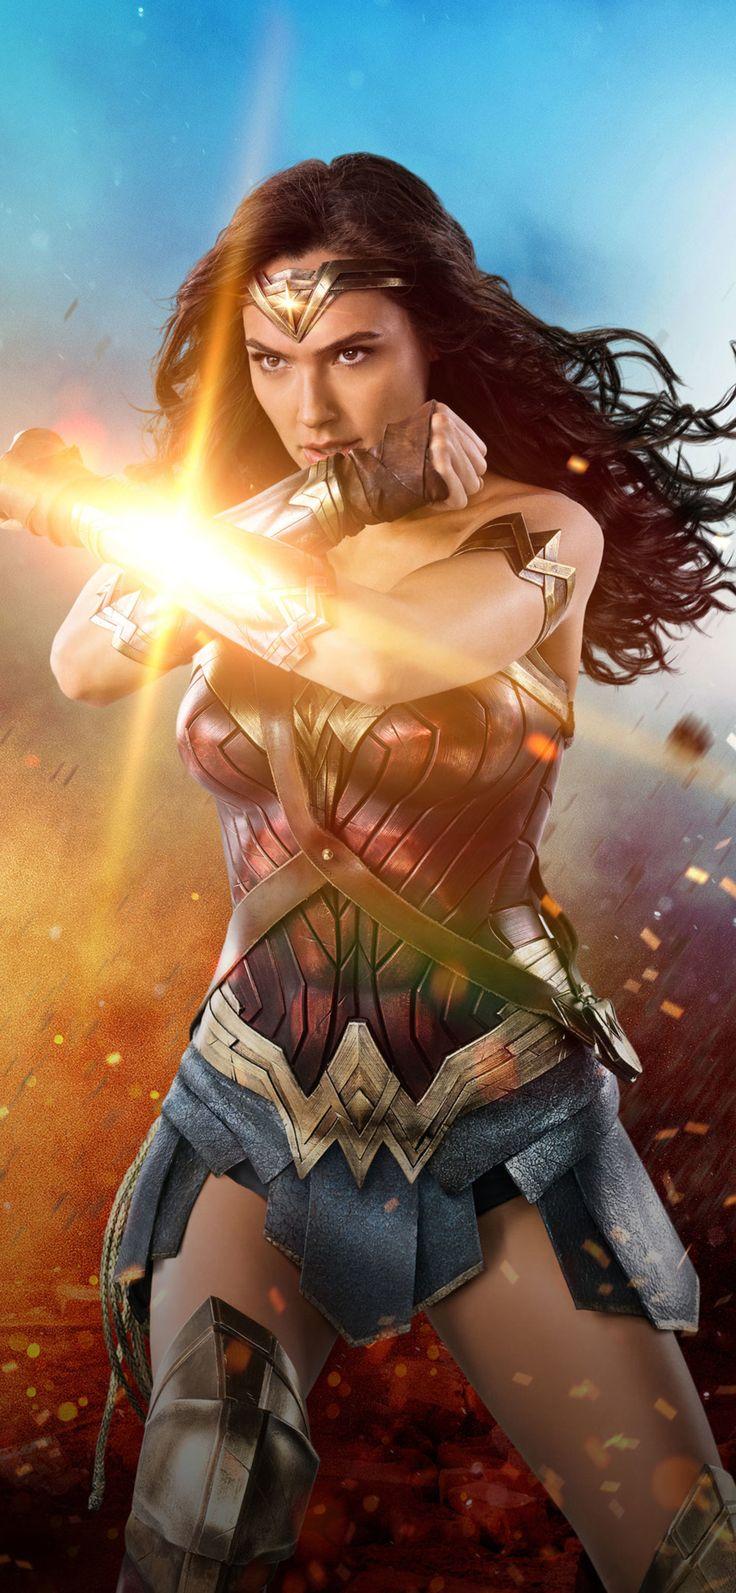 1125x2436 2017 Wonder Woman 4k Iphone XS,Iphone 10,Iphone